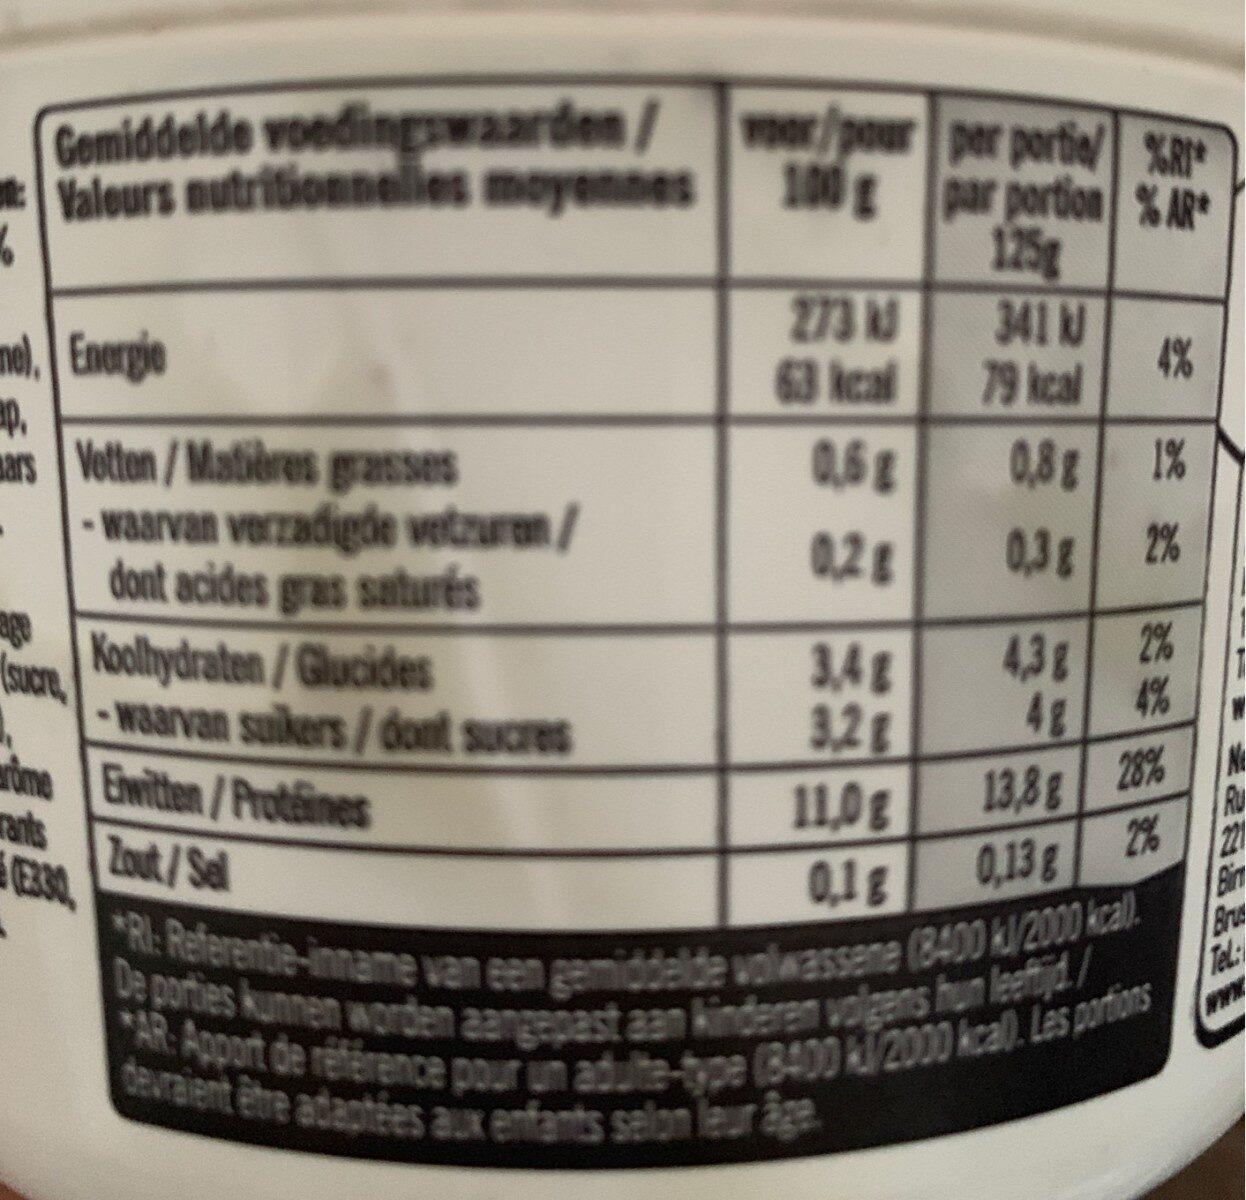 Kvarg stracciatella - Informations nutritionnelles - fr